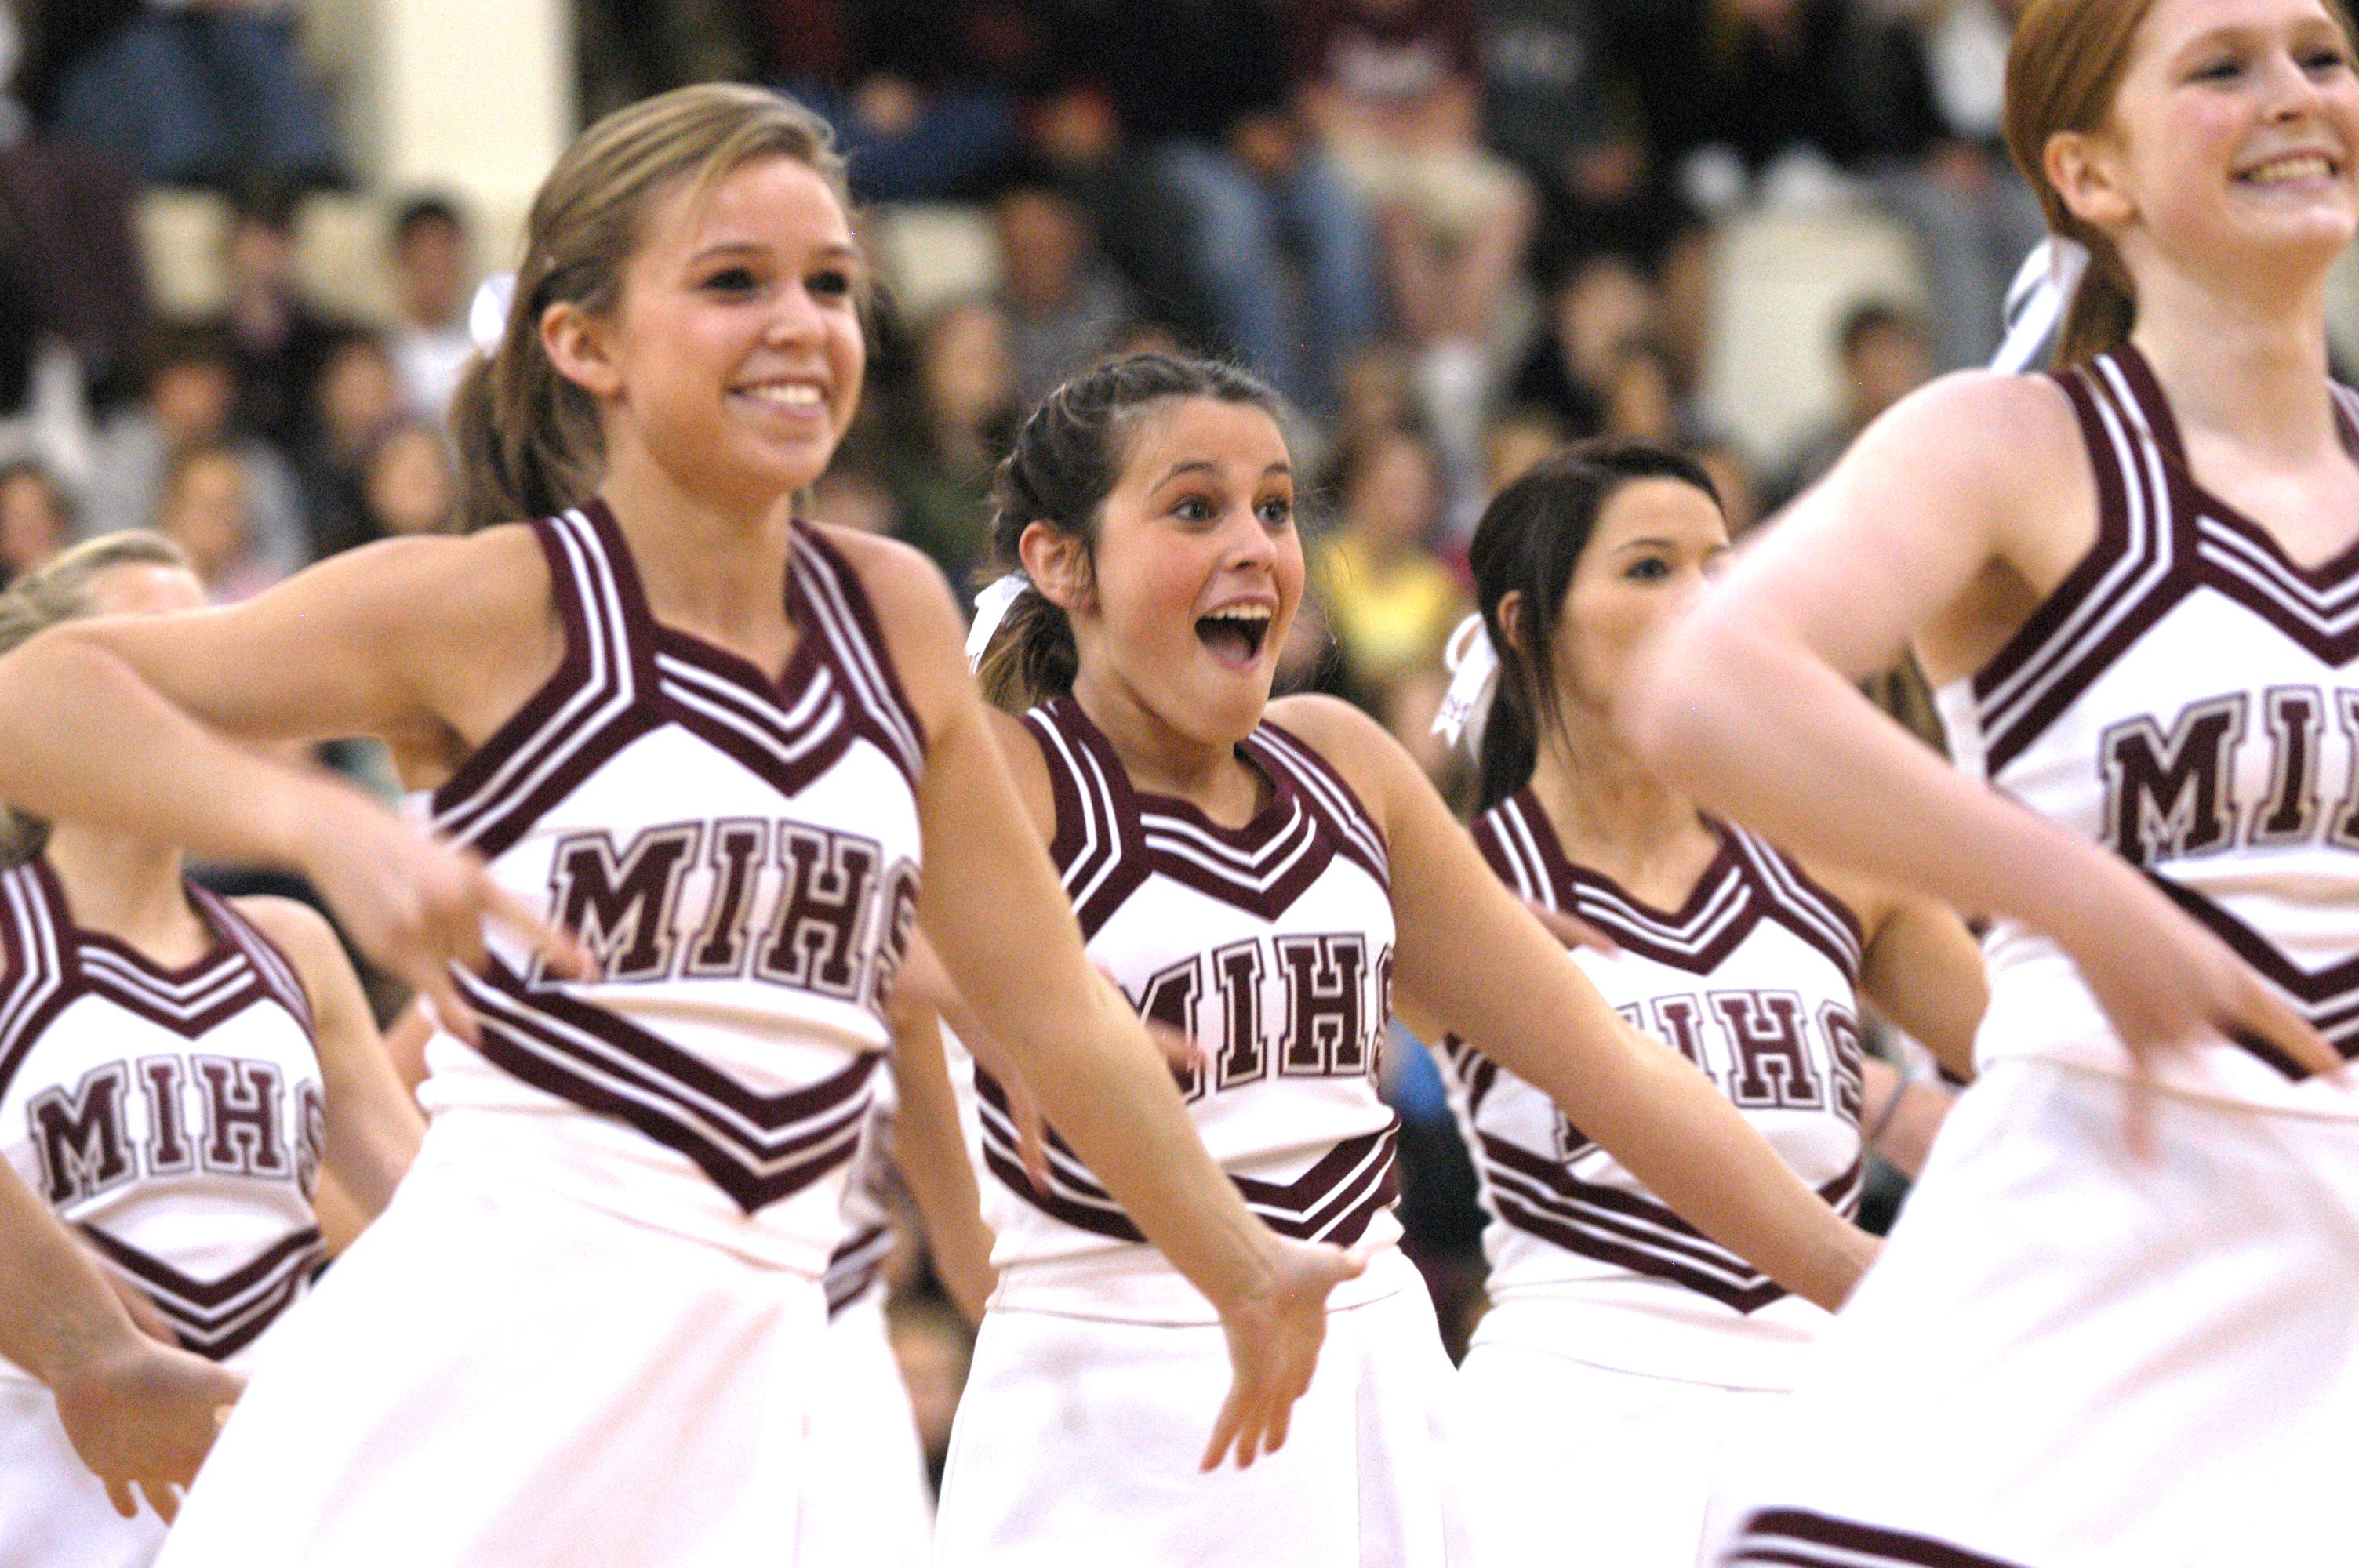 File:Mercer Island High School Cheerleaders.jpg - Wikimedia Commons